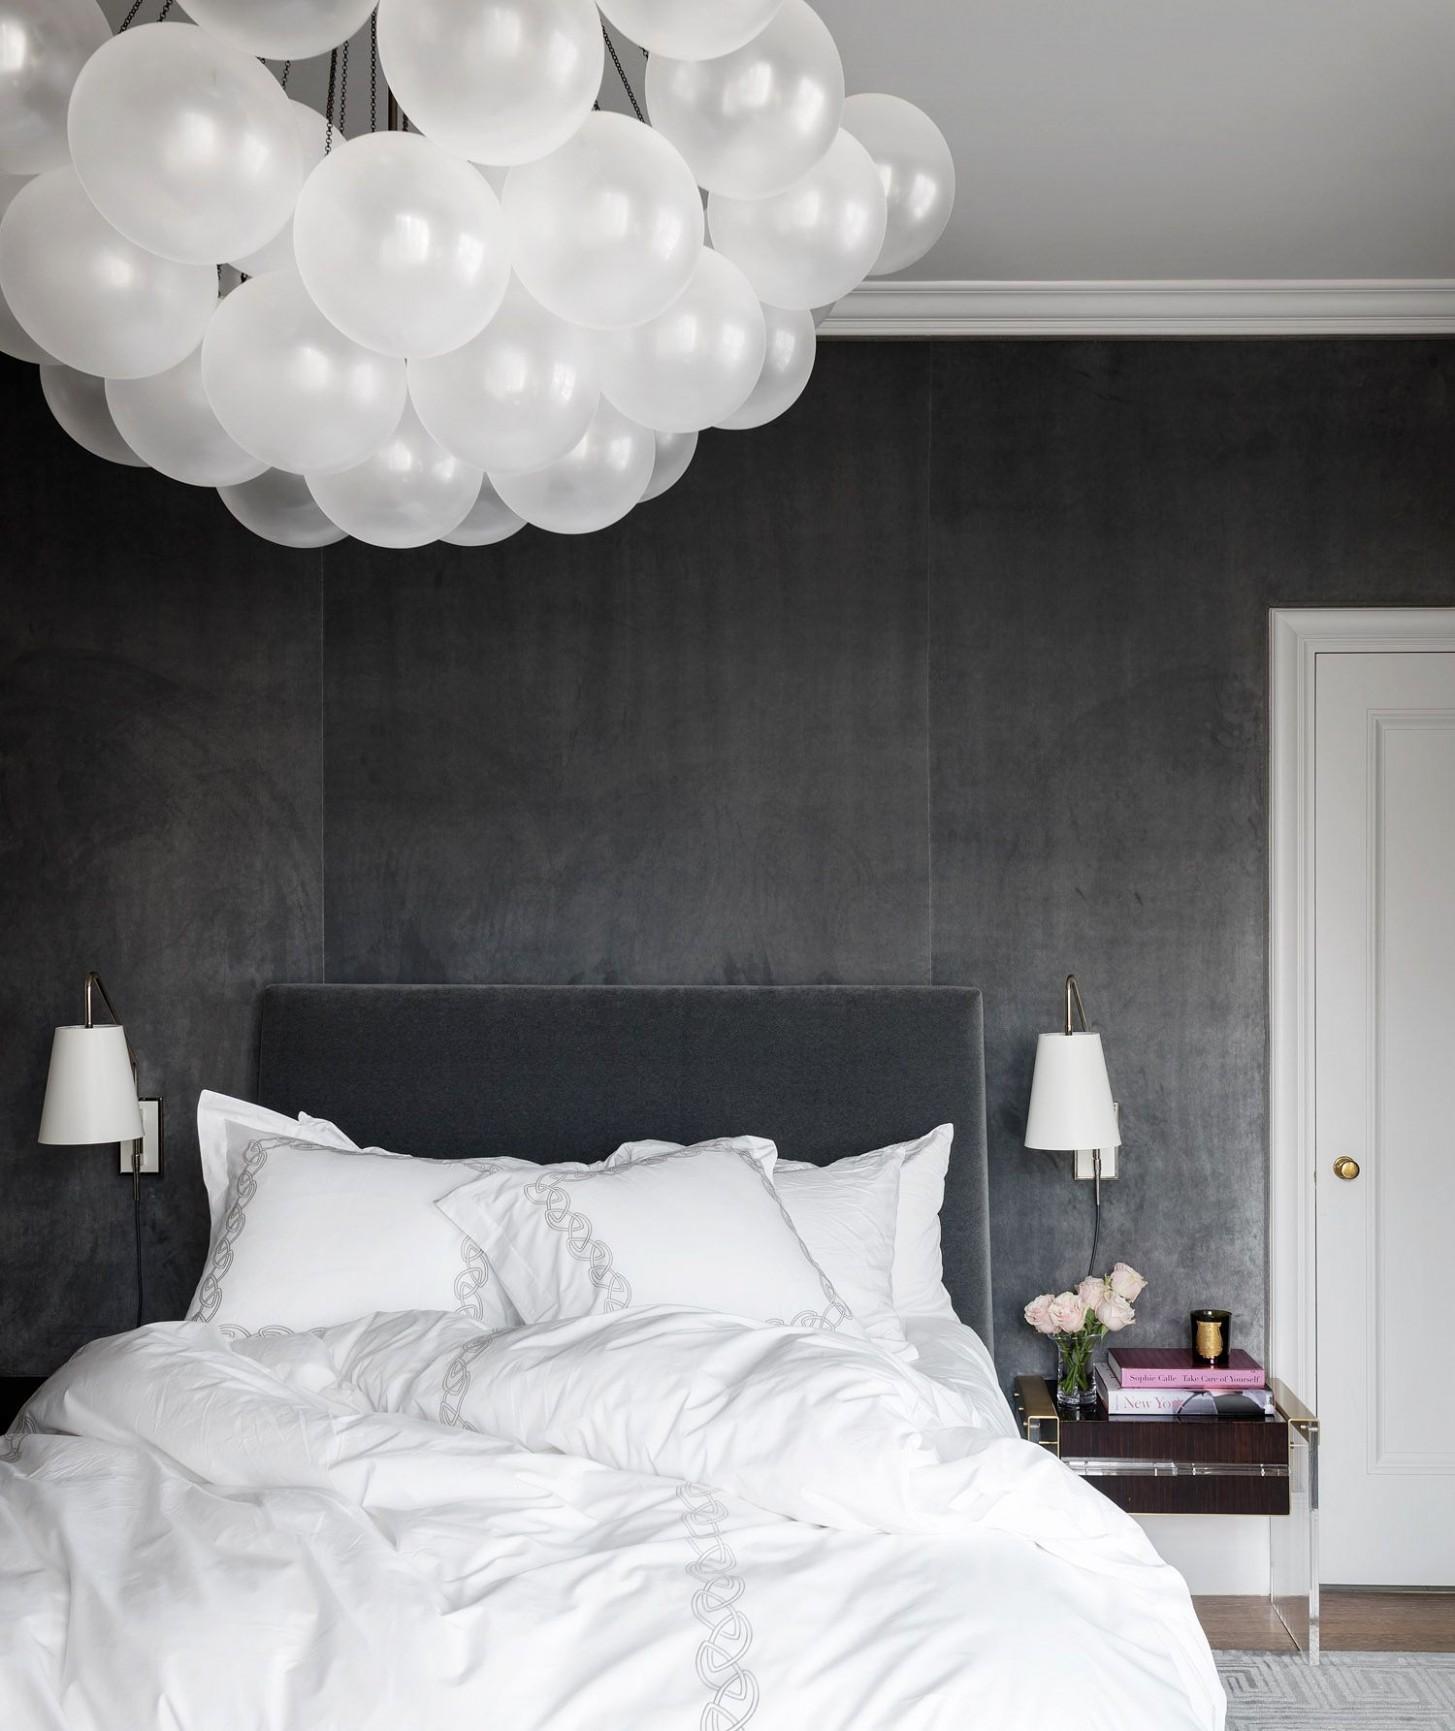 10 Romantic Bedroom Ideas - Sexy Bedroom Style Tips and Decor - Bedroom Ideas Romantic